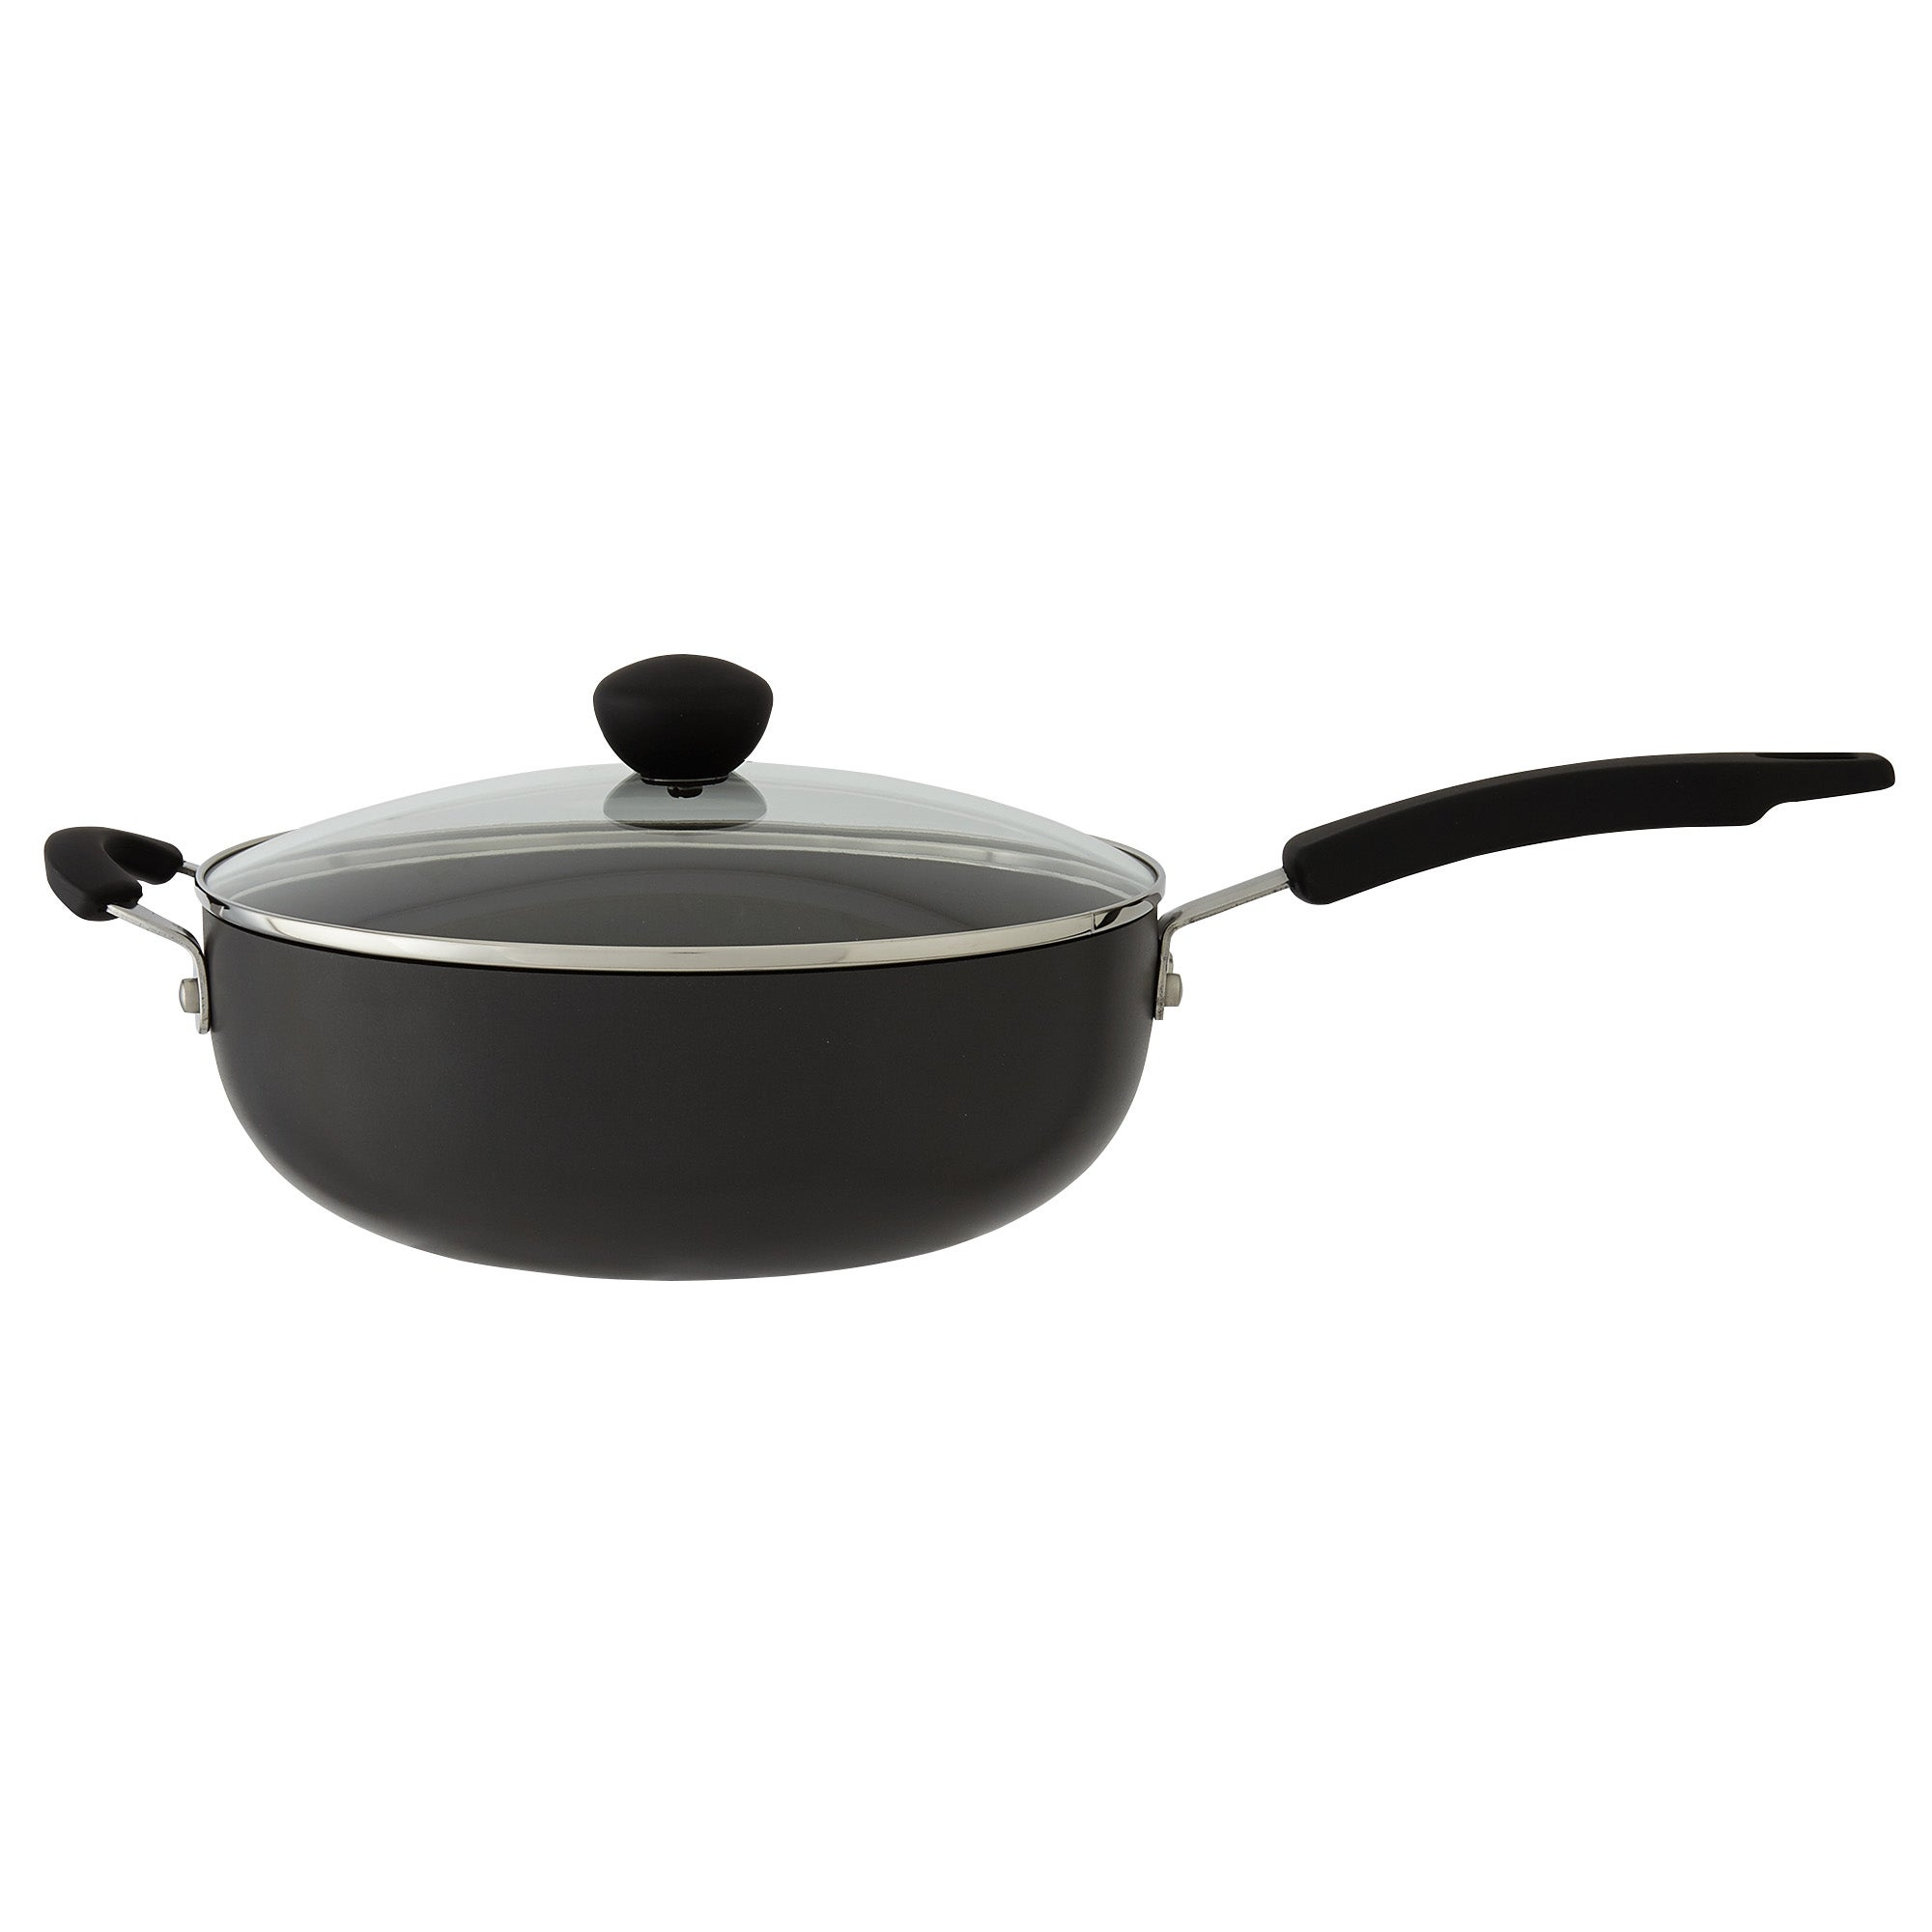 Photo of Dunelm hard anodised 26cm everyday pan black